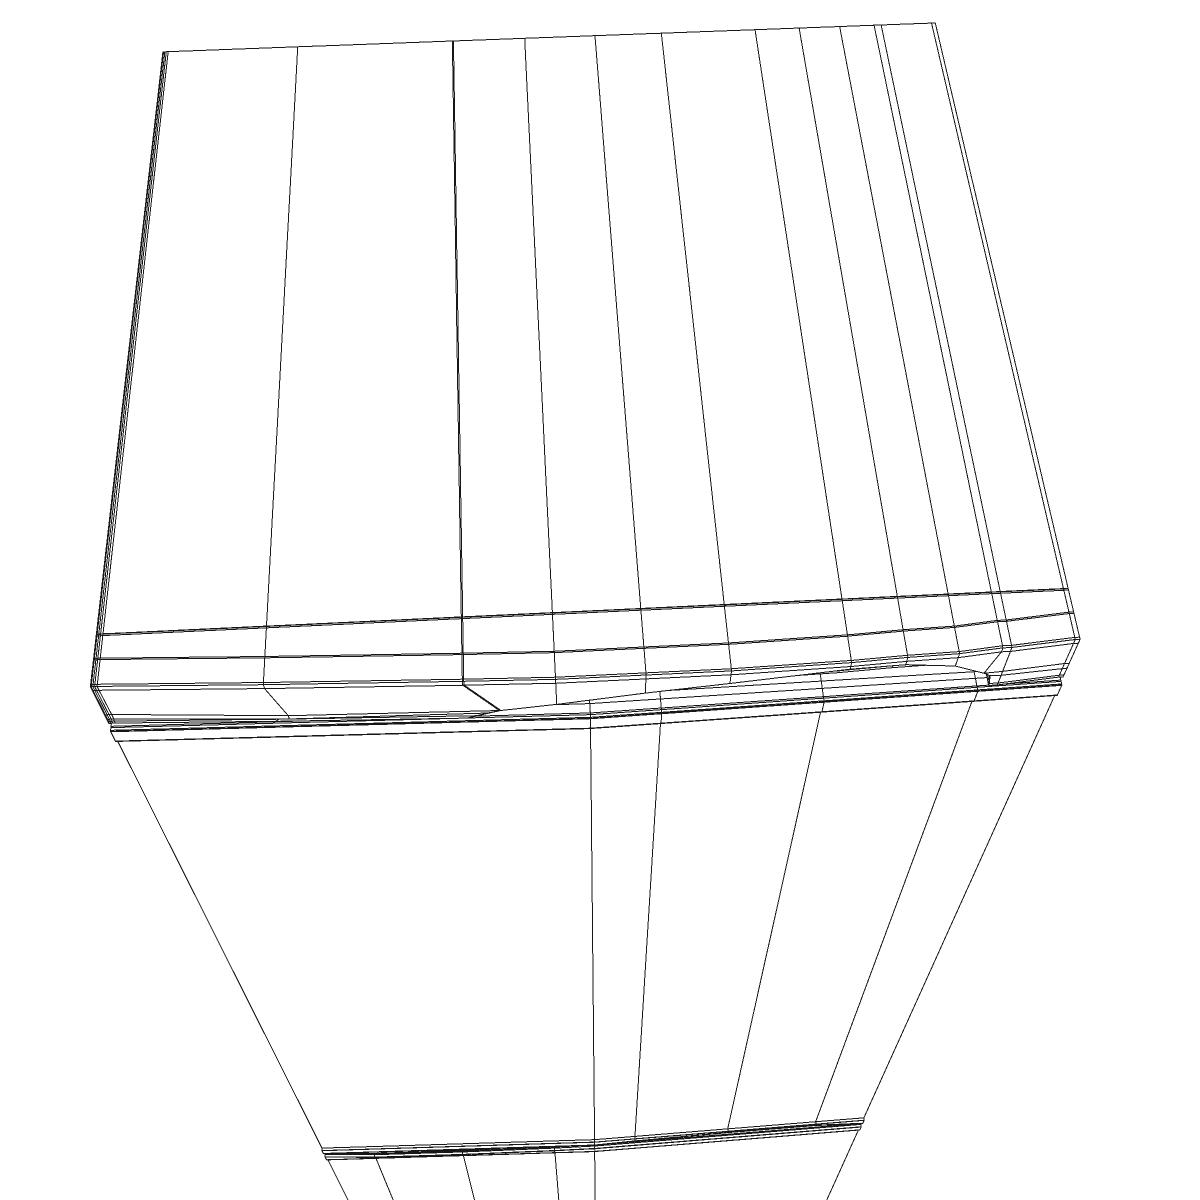 fridge 3d model 3ds max fbx ma mb obj 158914